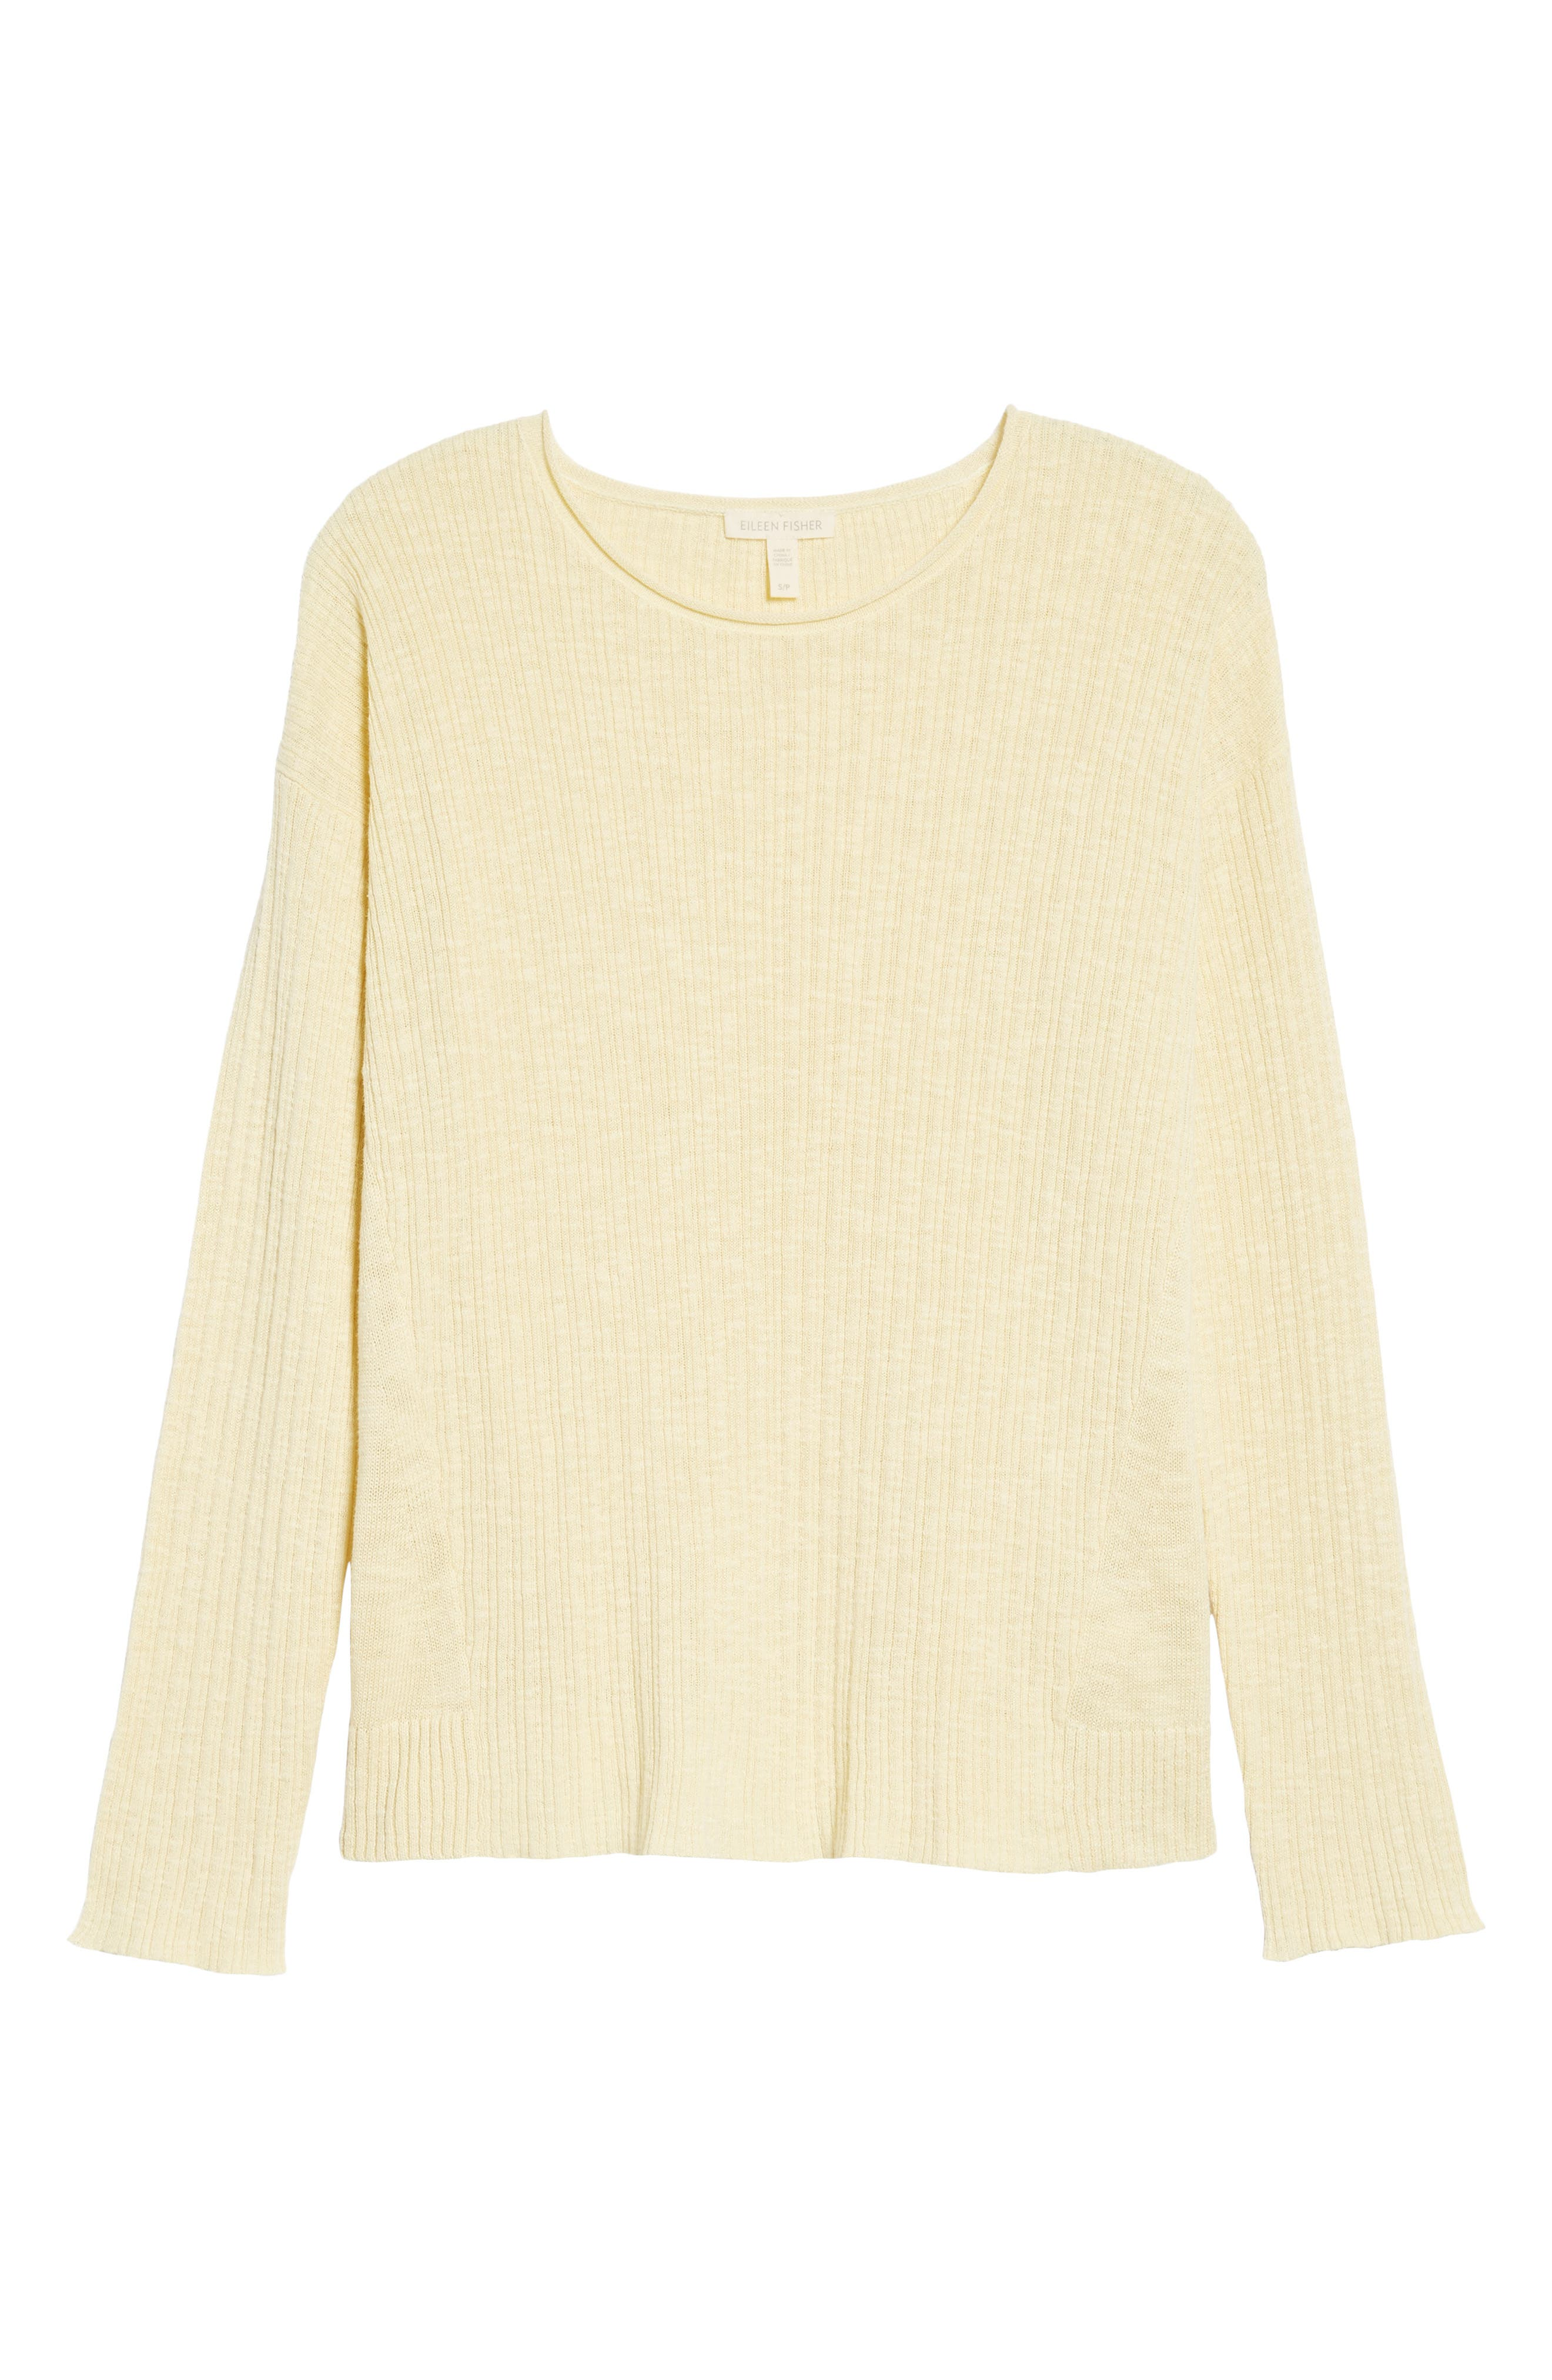 Organic Linen & Cotton Crewneck Sweater,                             Alternate thumbnail 27, color,